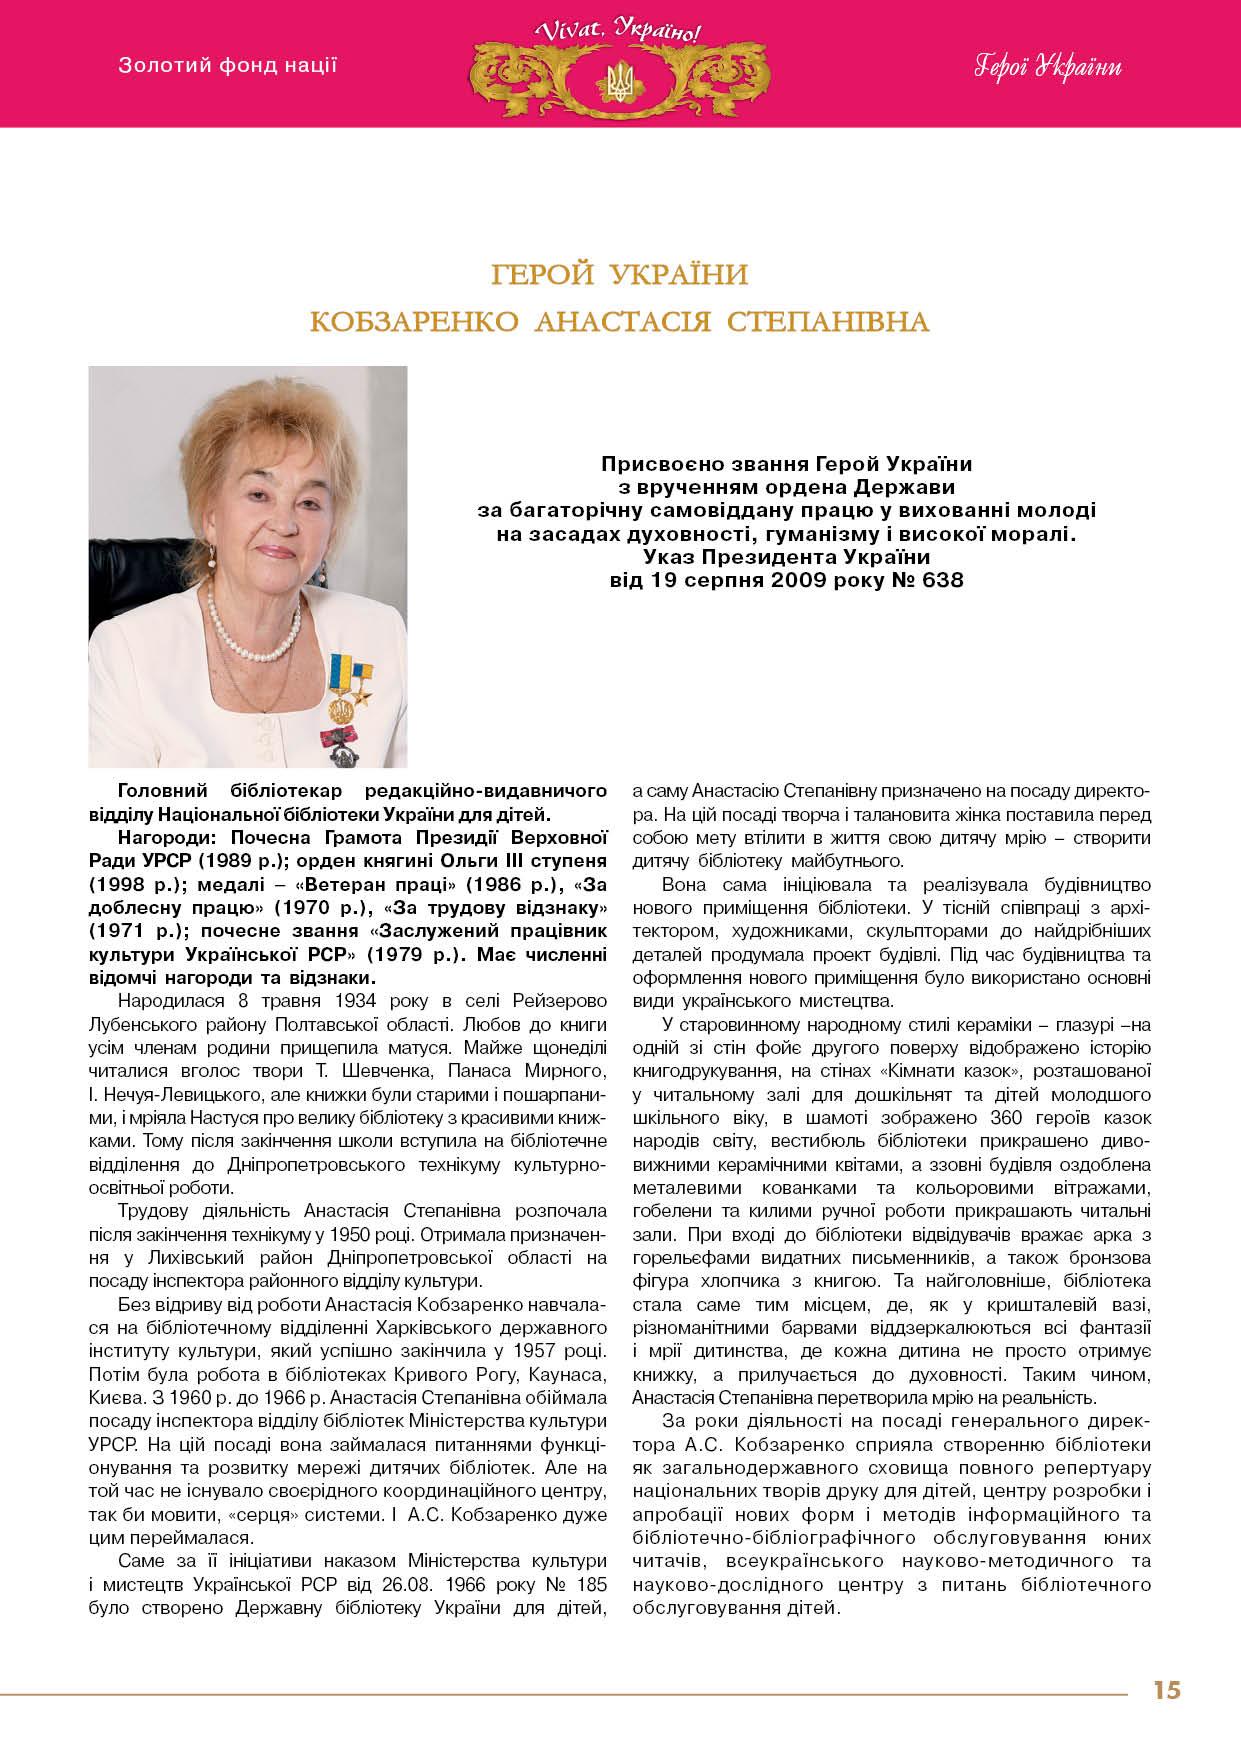 Кобзаренко Анастасія Степанівна